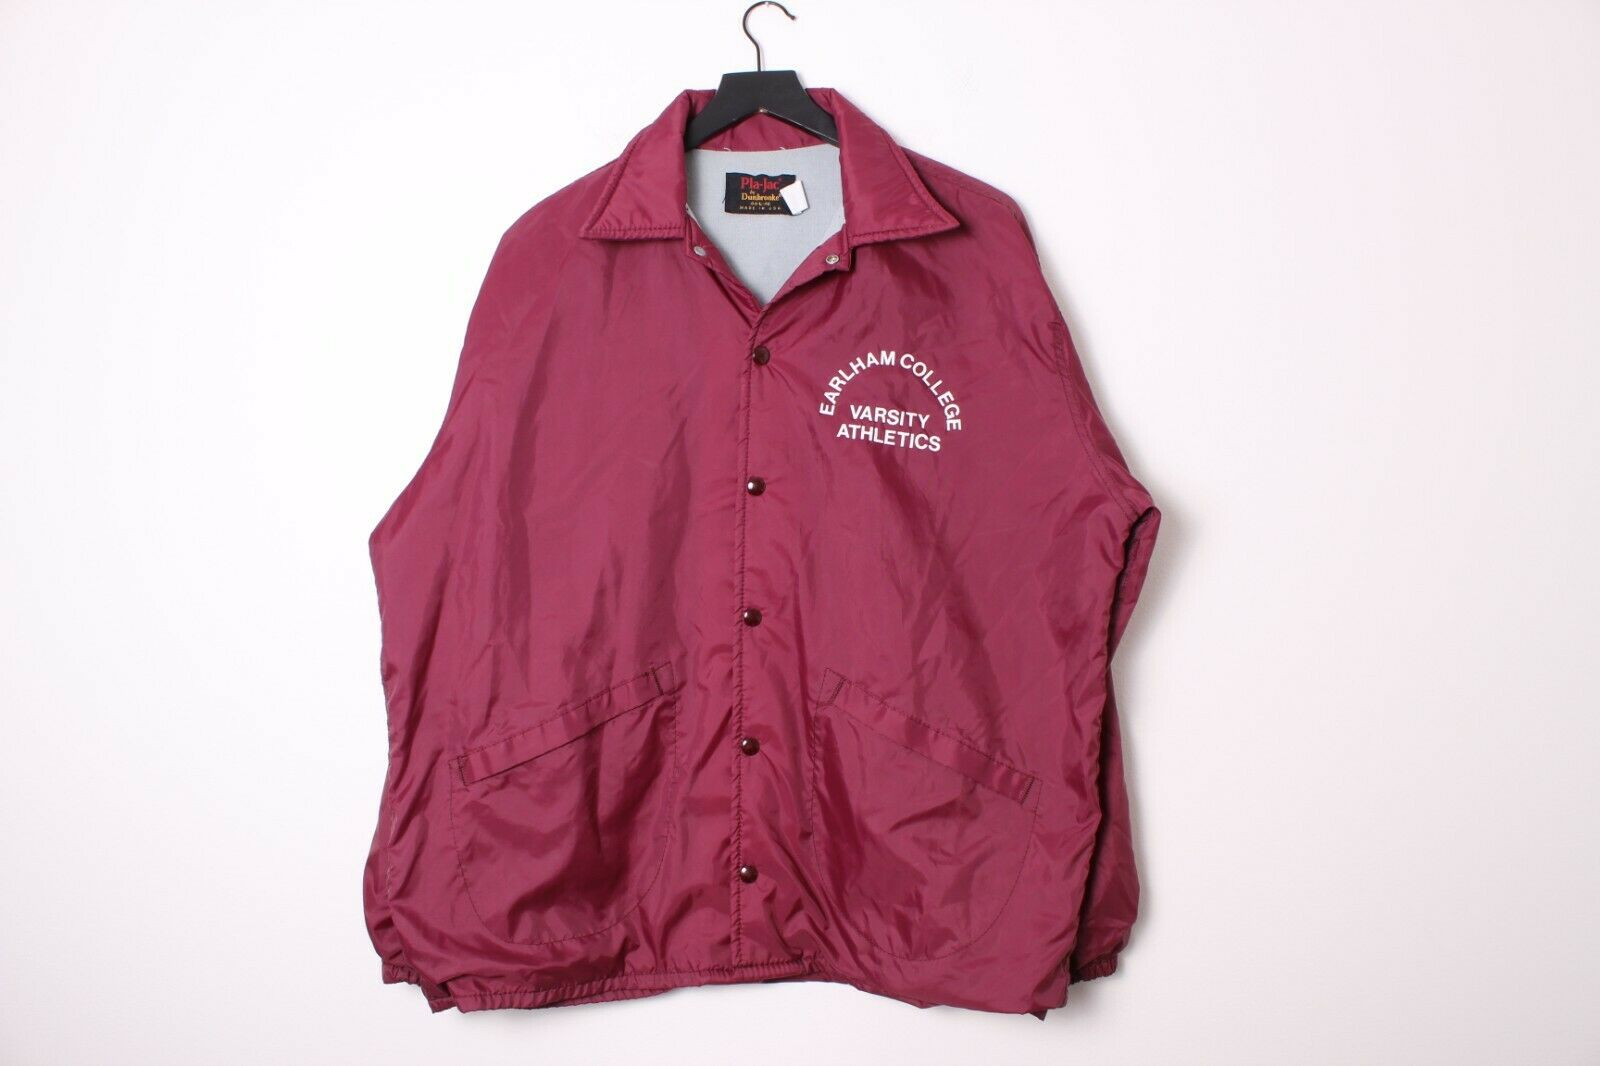 Vintage 80's USA-Made Earlham College Varsity Athletics Nylon Jacket - Large